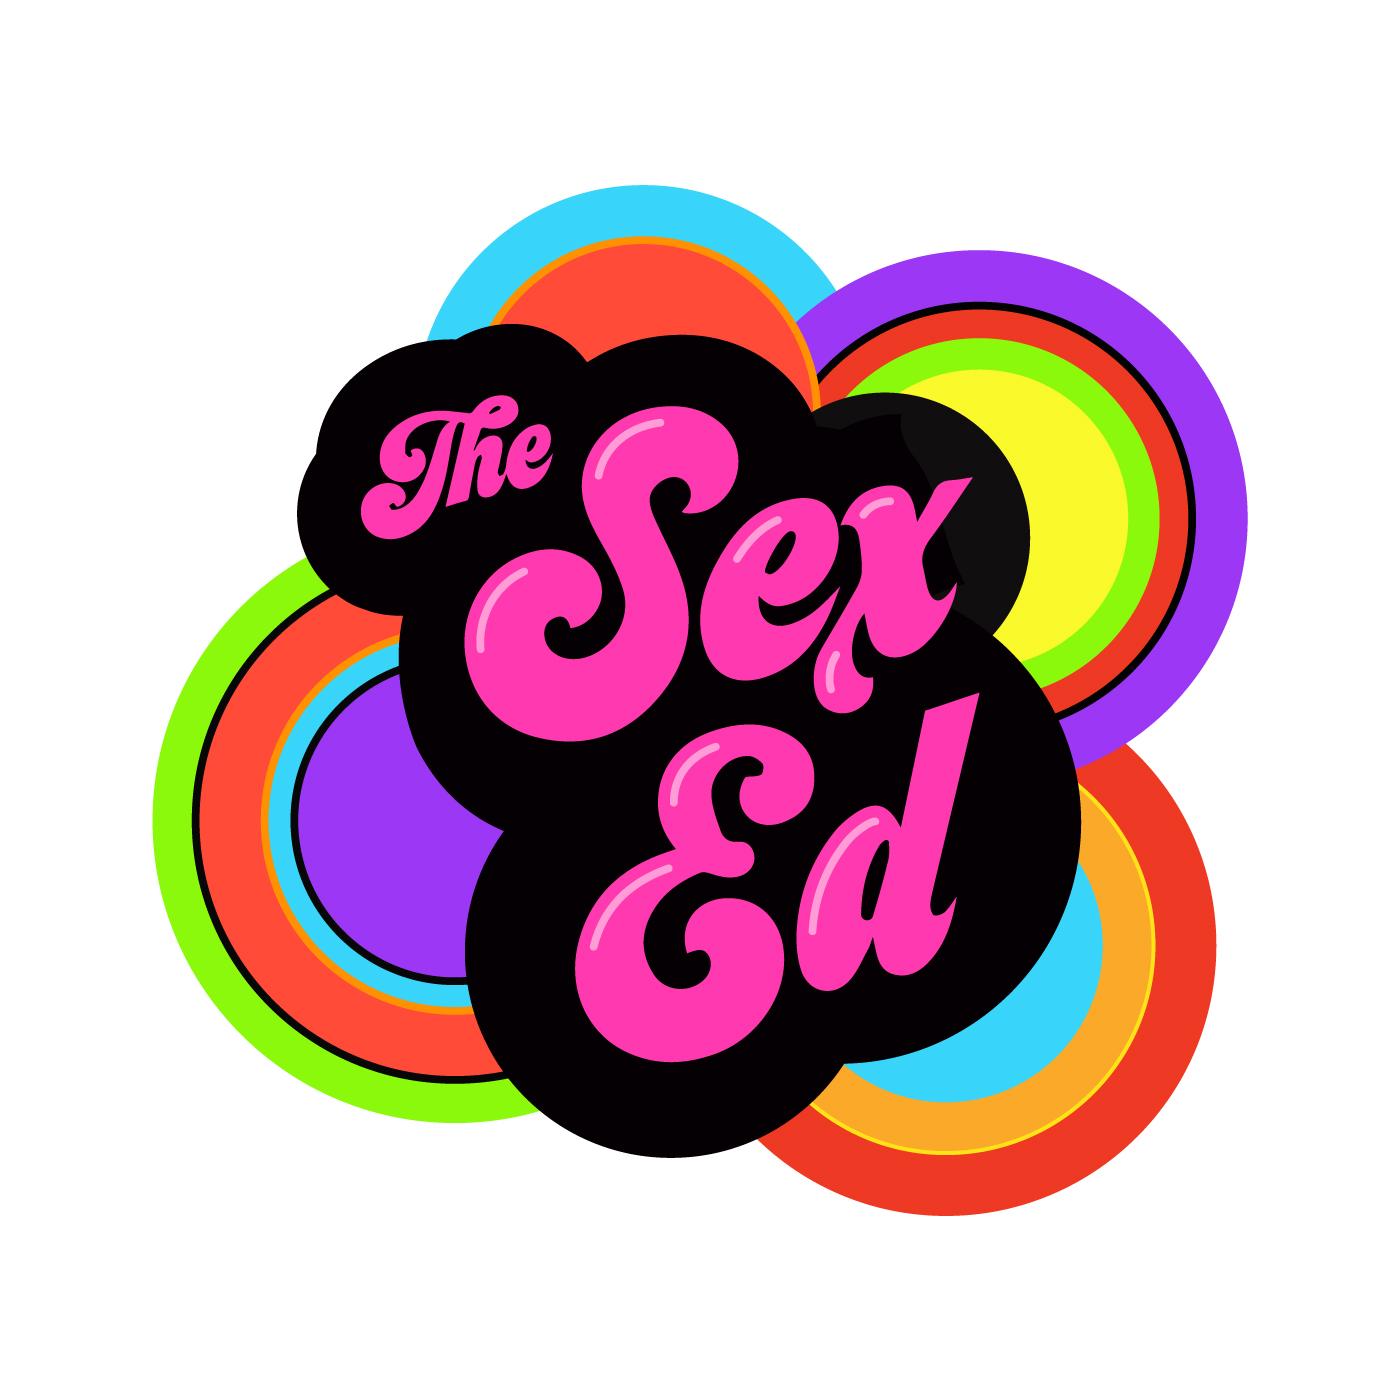 The Sex Ed show art